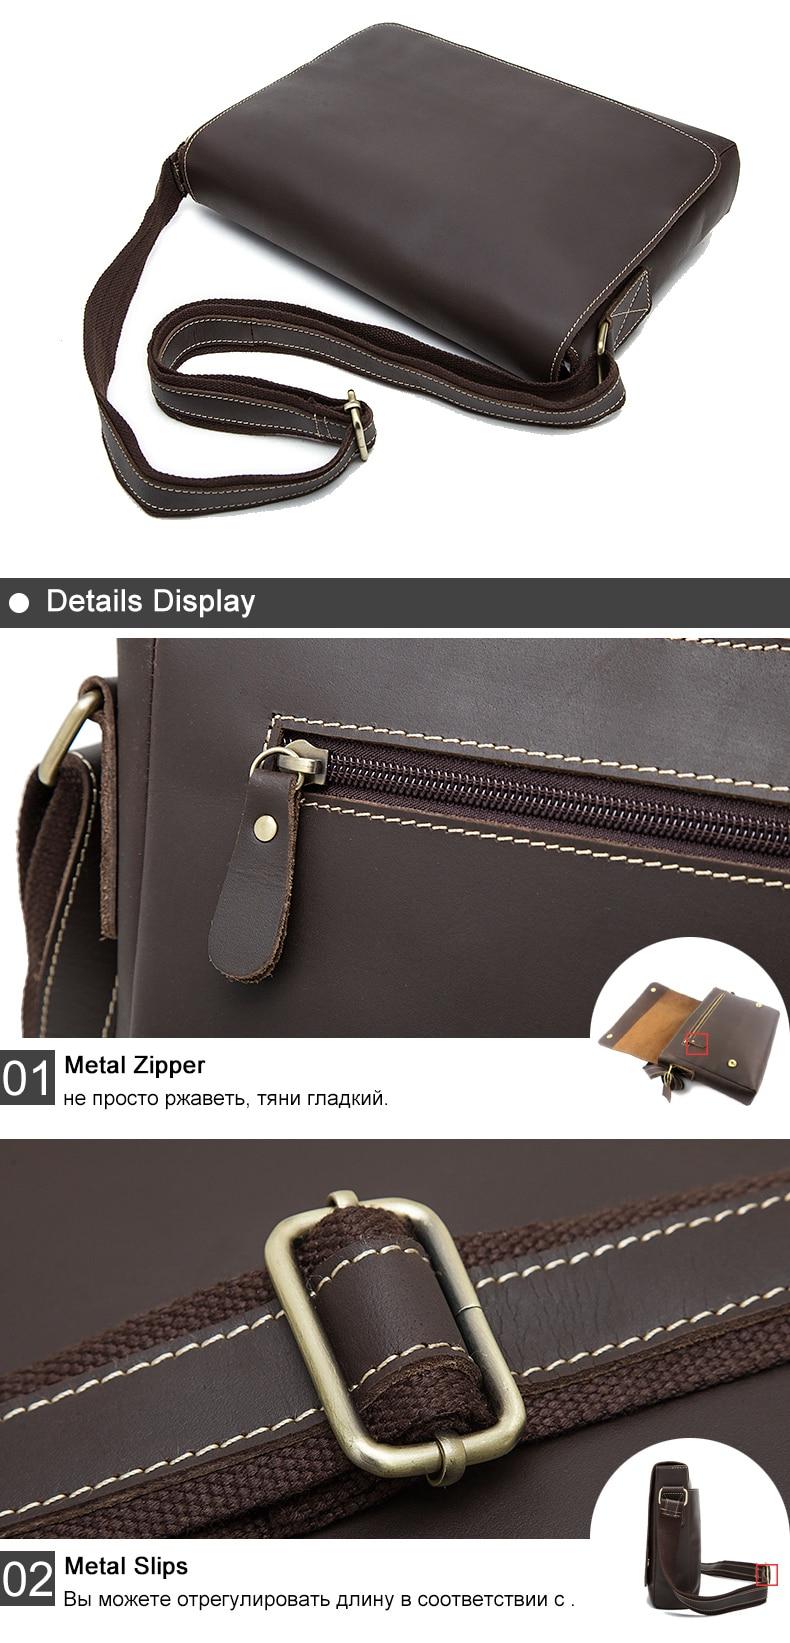 HTB1ybybR4YaK1RjSZFnq6y80pXab WESTAL Men's Briefcases Laptop Bag Leather Lawyer/office Bags Messenger Bags Men's Crazy Horse Leather Briefcases Business Bag